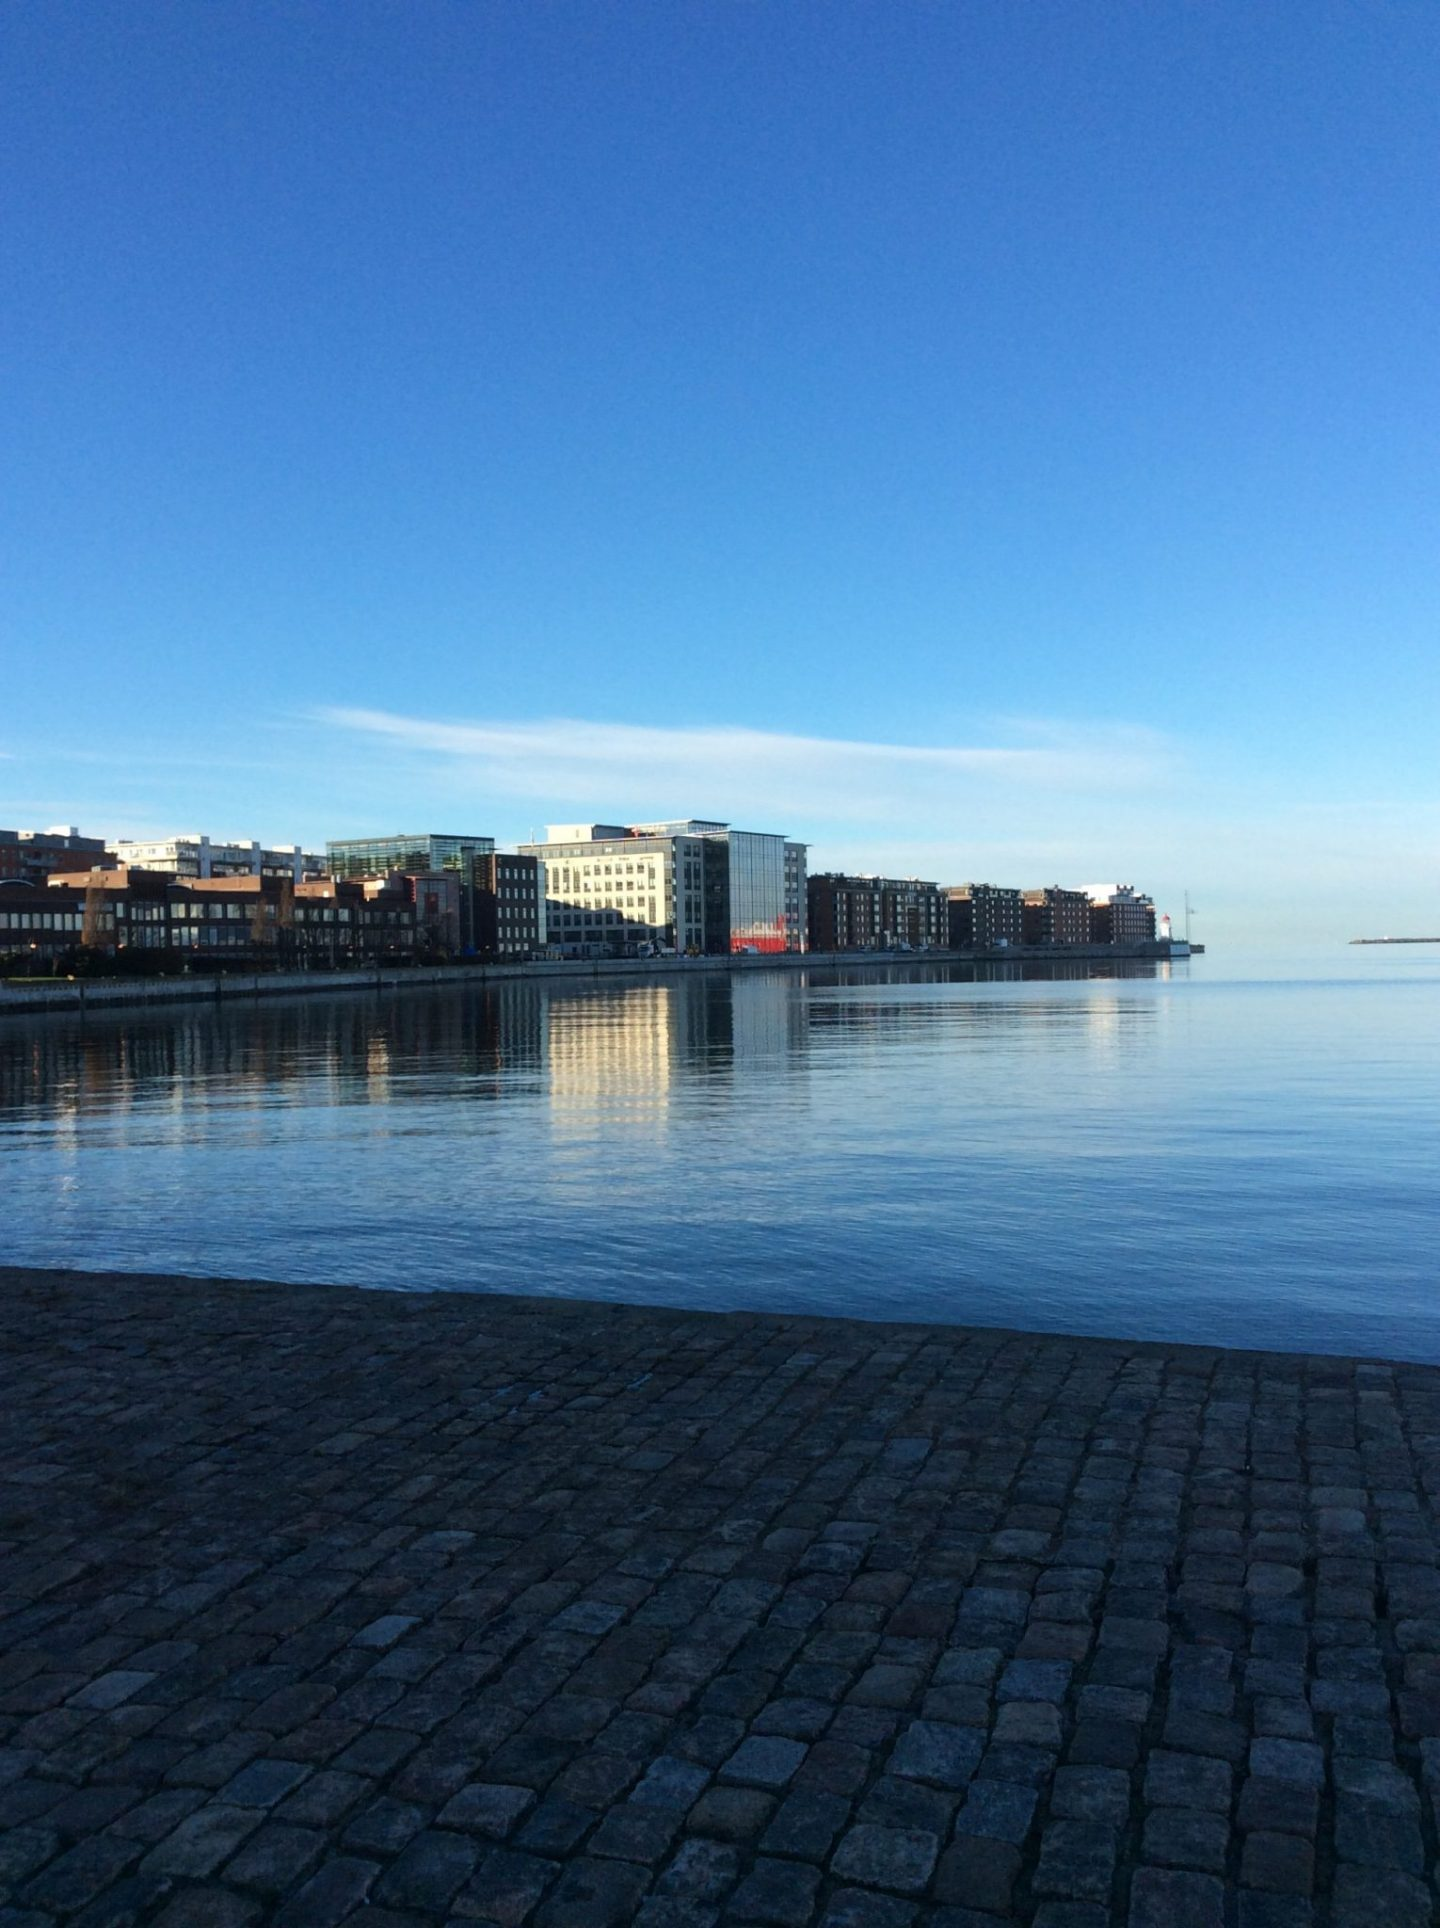 IMG 0219 1440x1928 - Malmö: a modern city